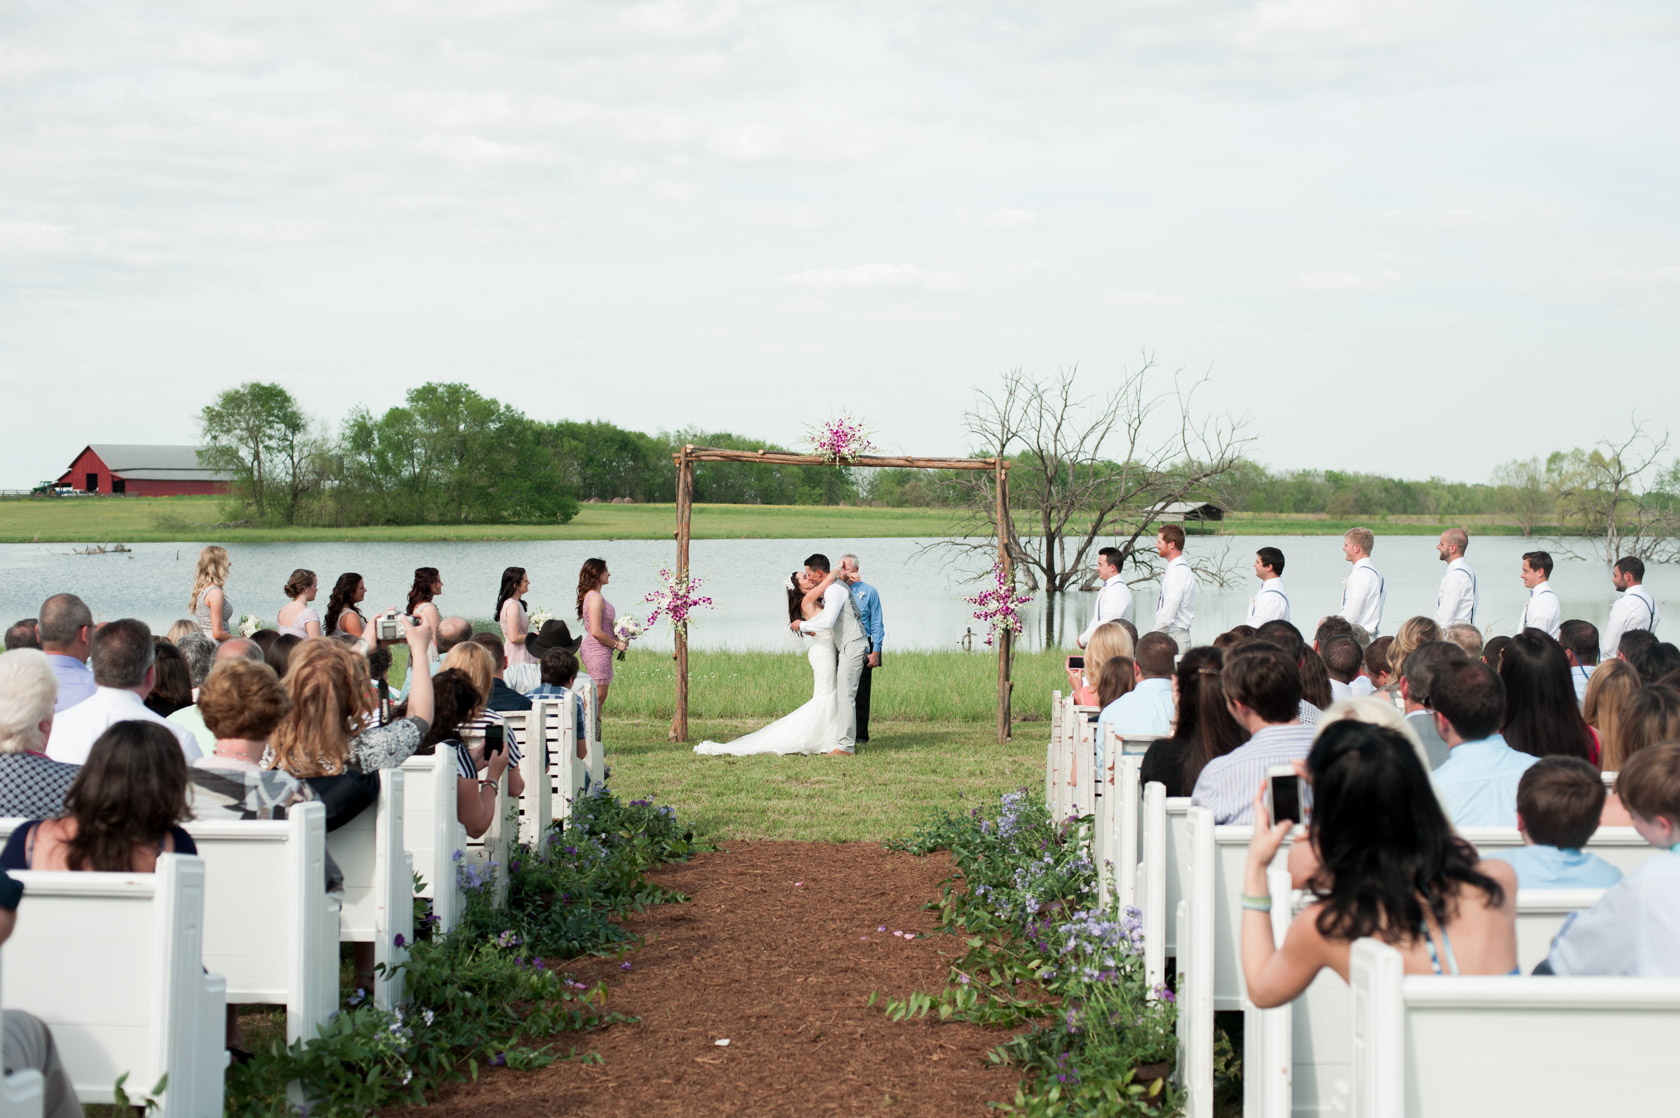 Church pews at an outdoor, Alabama Wedding. Photos by Kelli + Daniel Taylor Photography